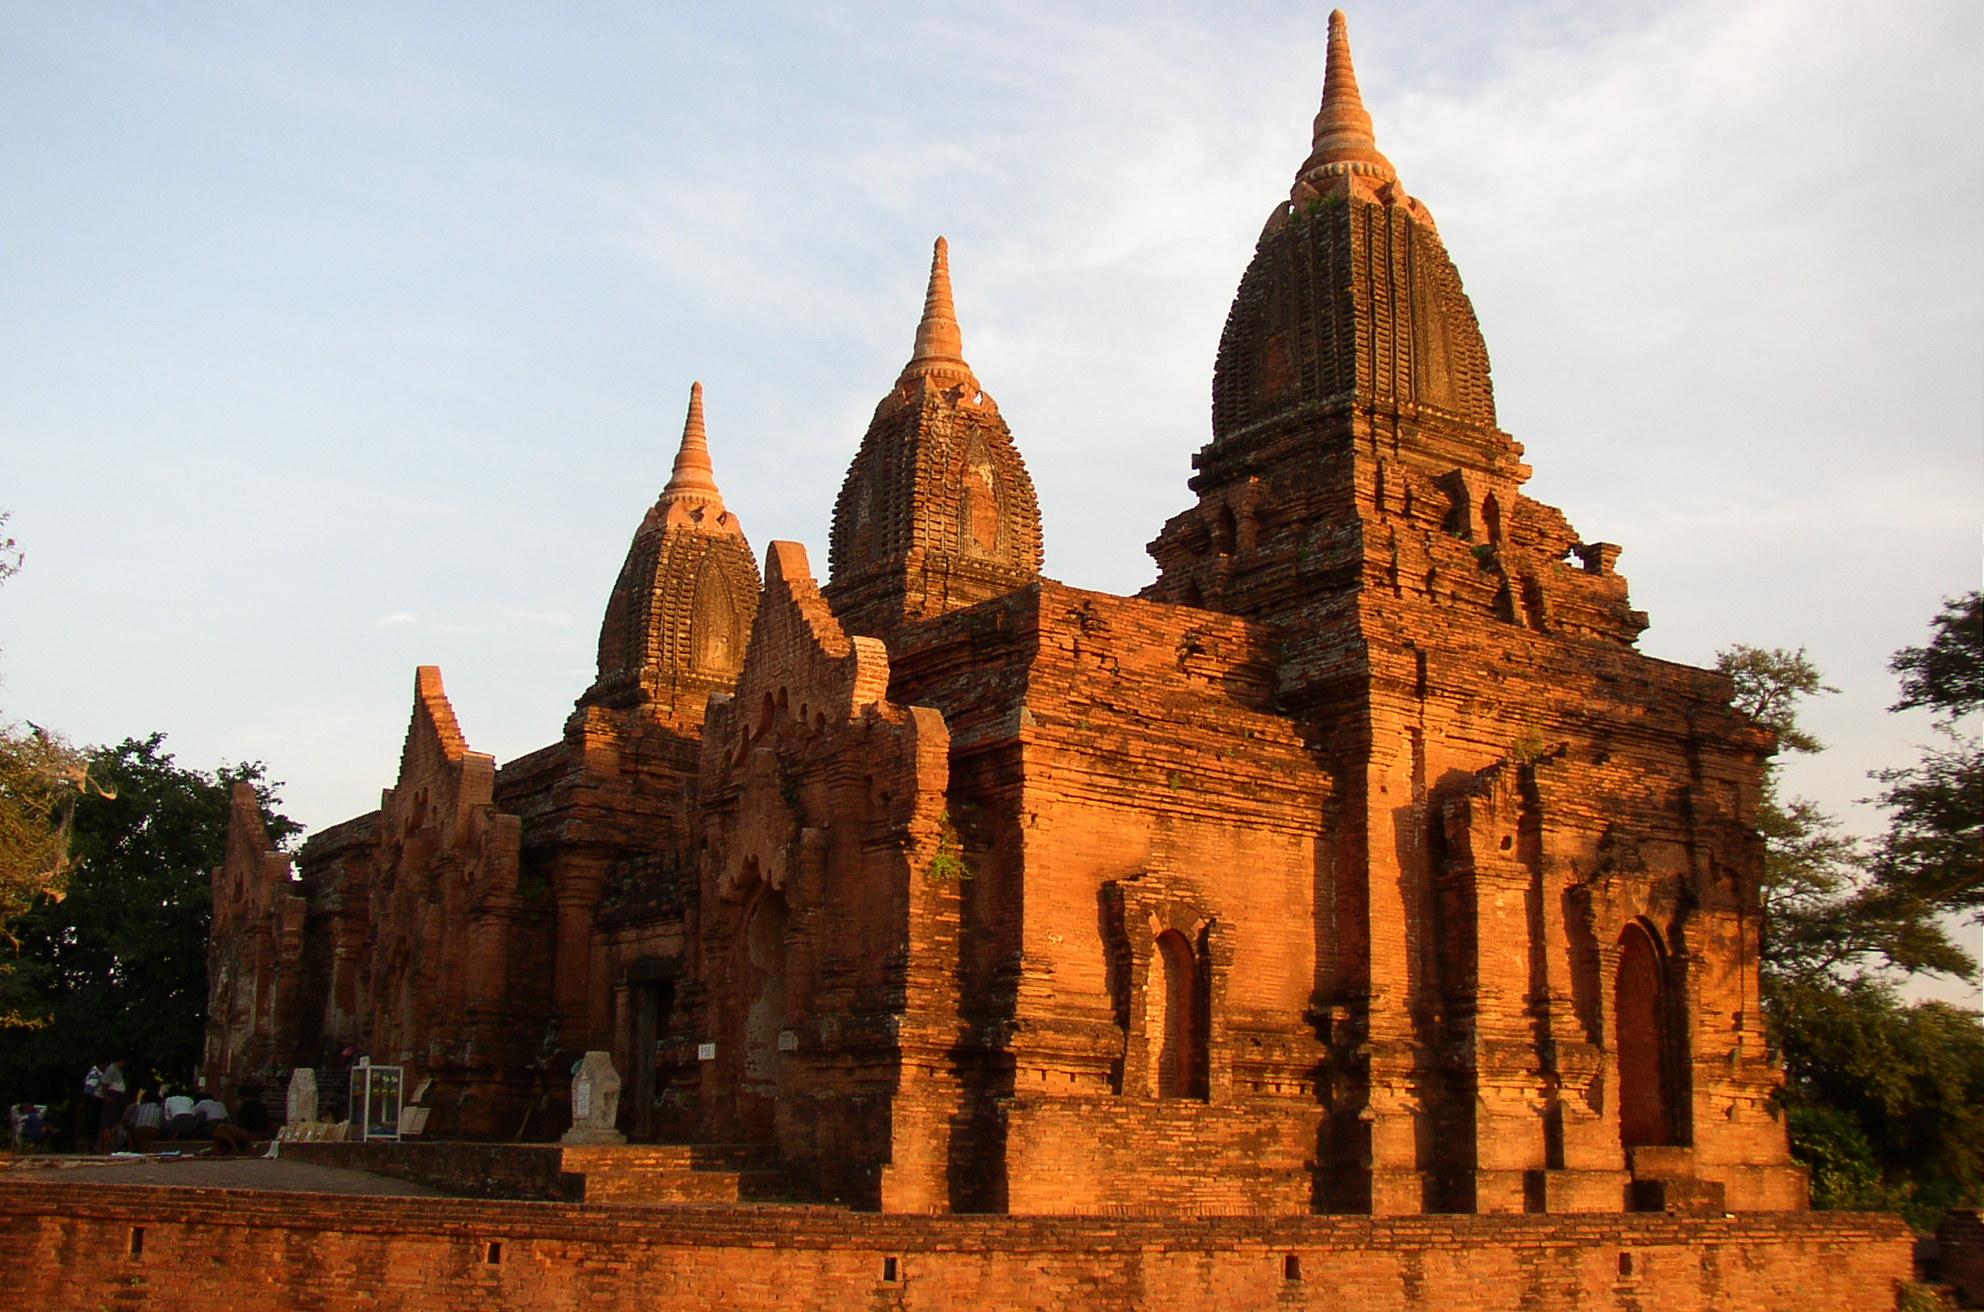 filming locations in Myanmar - Bagan